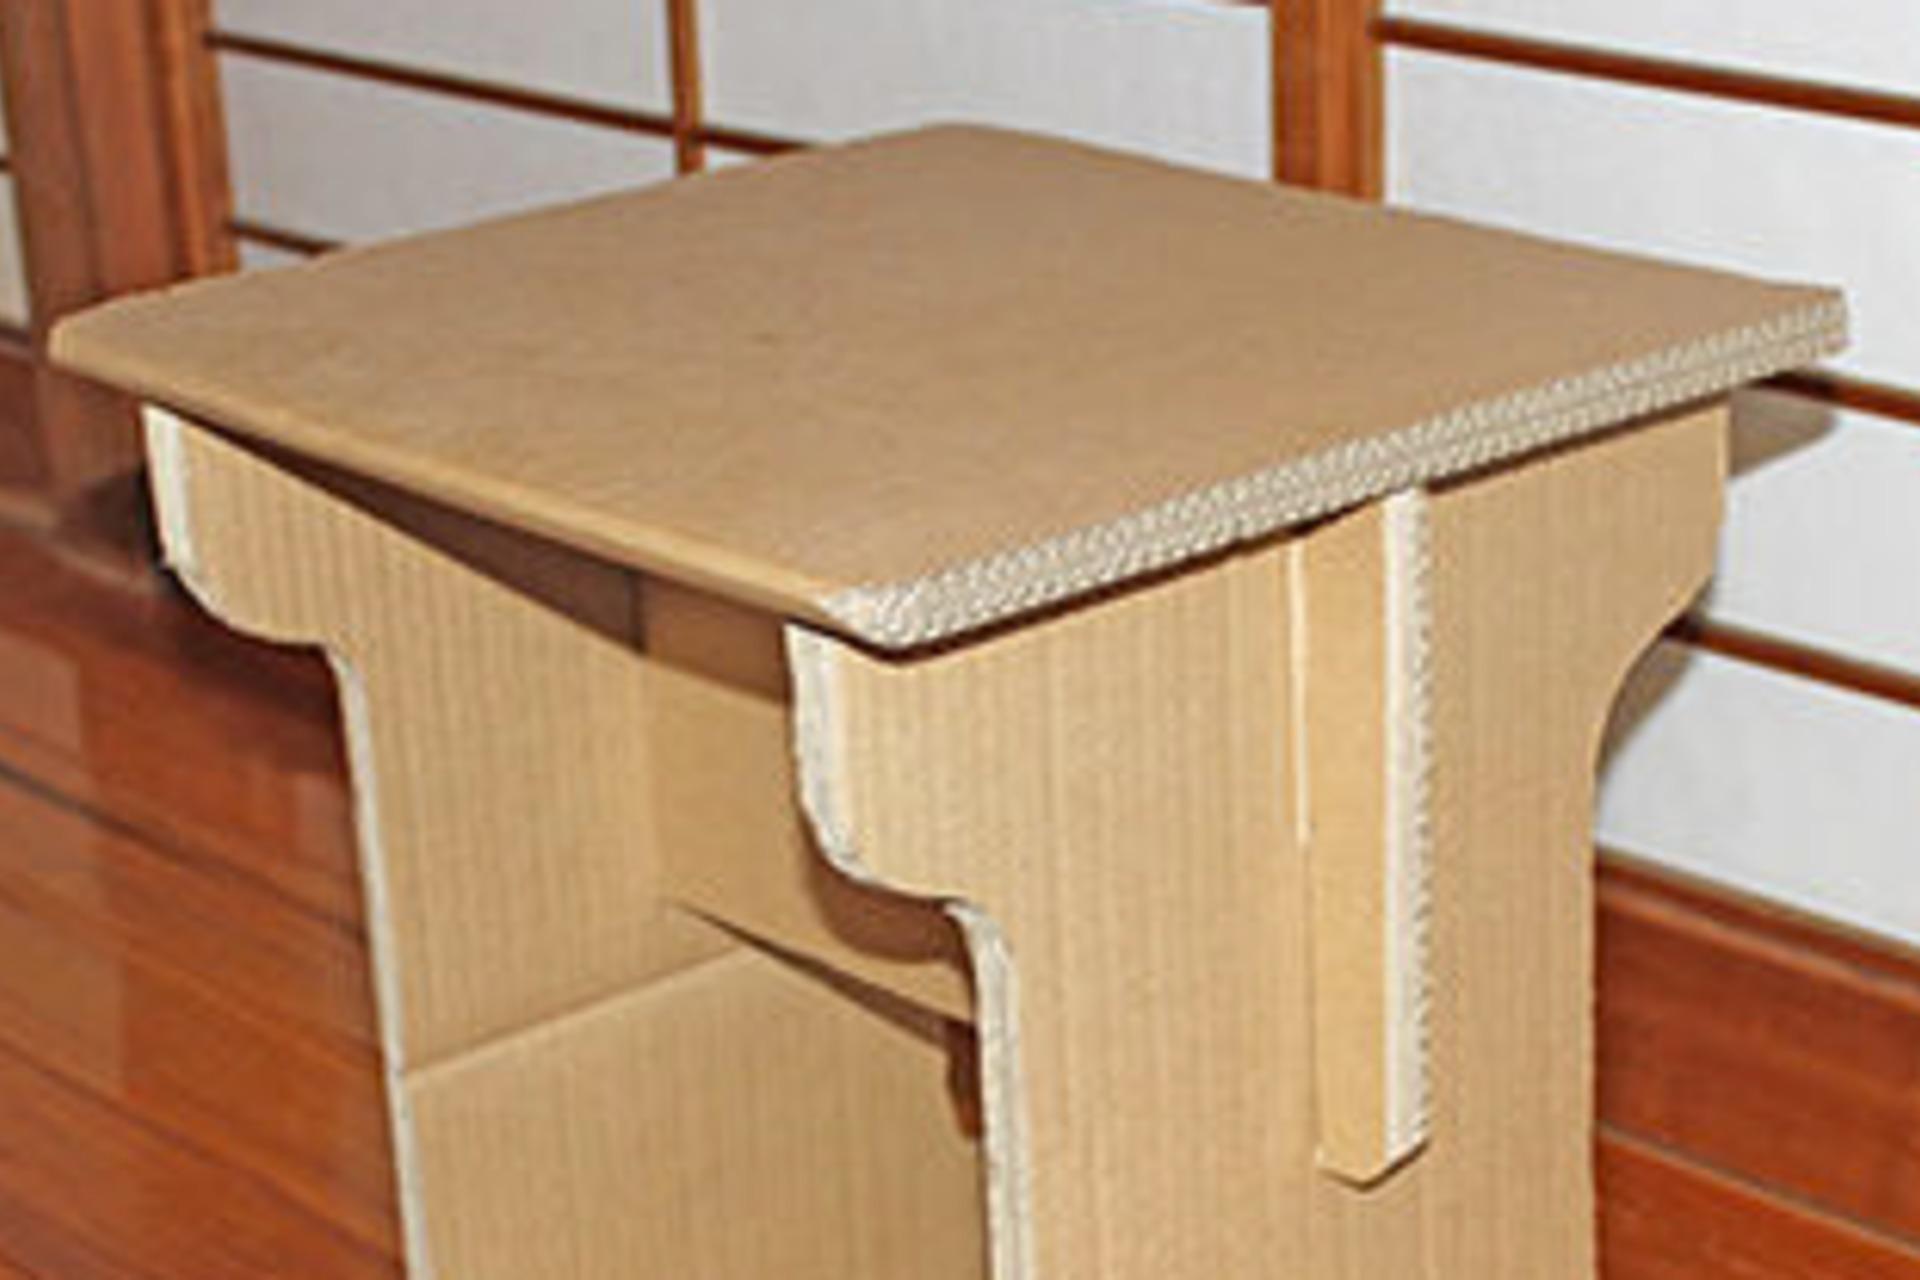 diy cardboard furniture. Good Make Cardboard Furniture DIY Diy